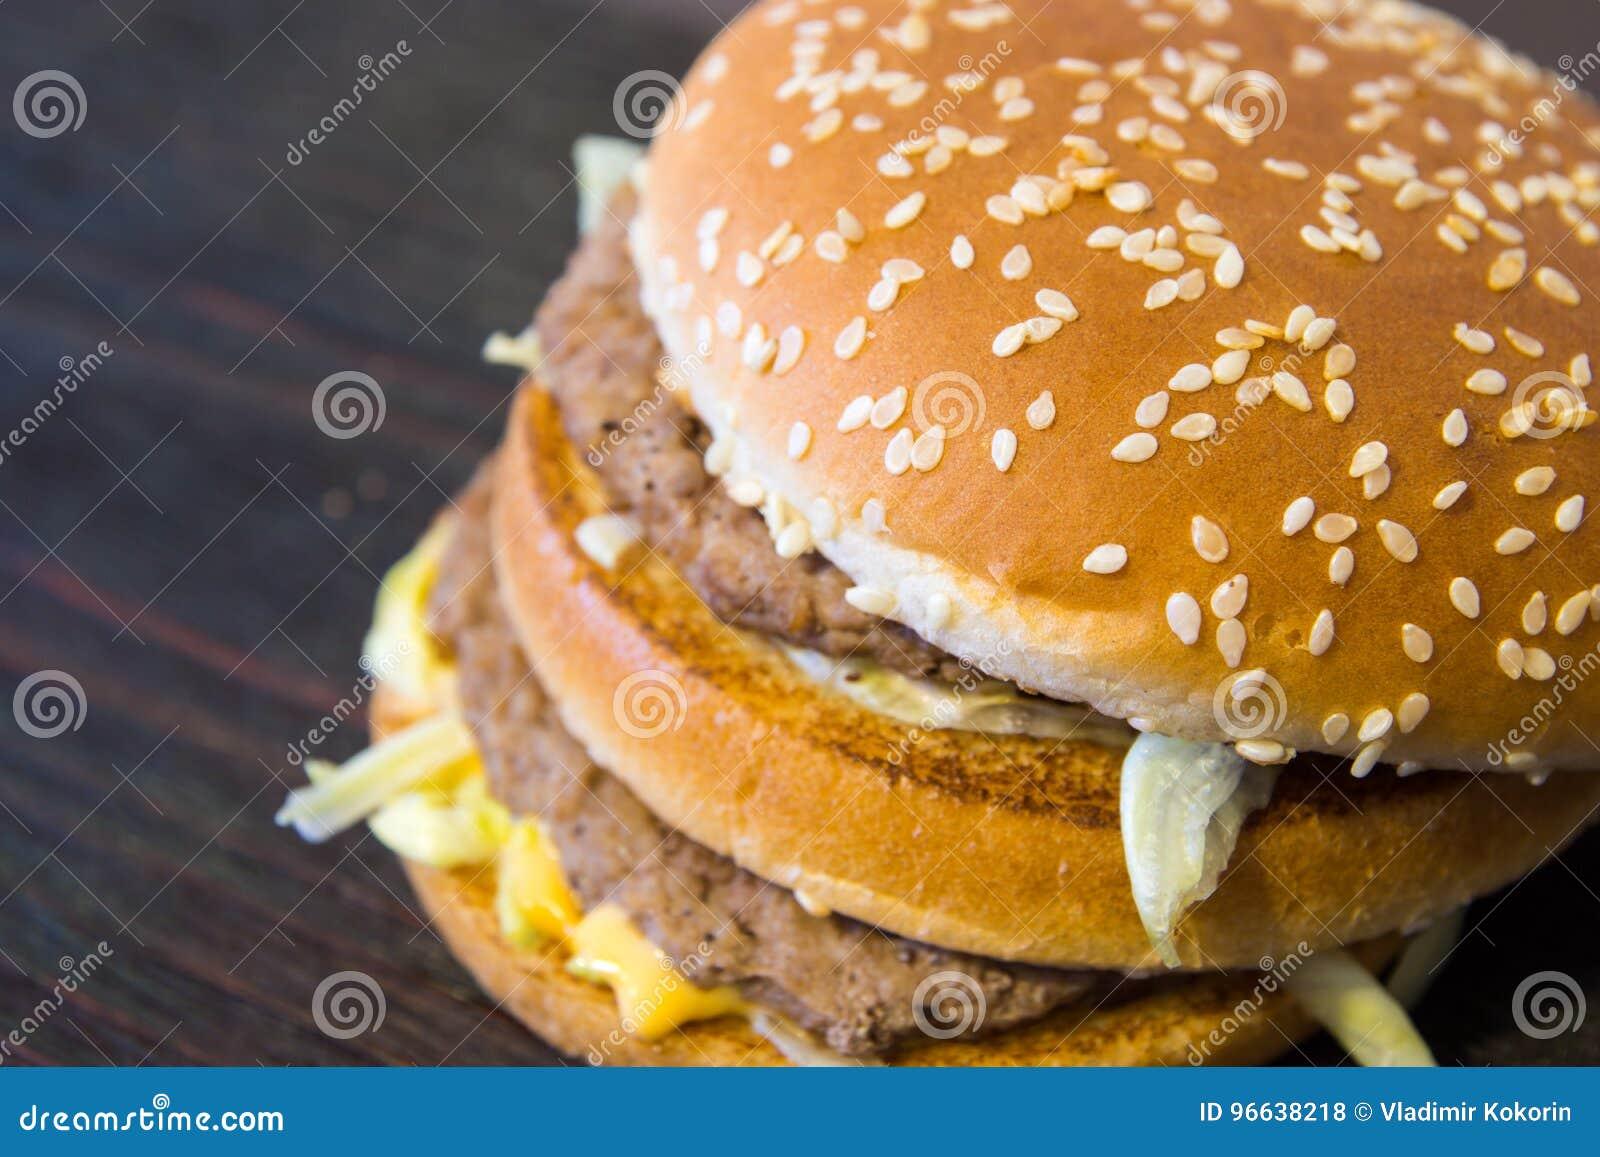 Un hamburger juteux